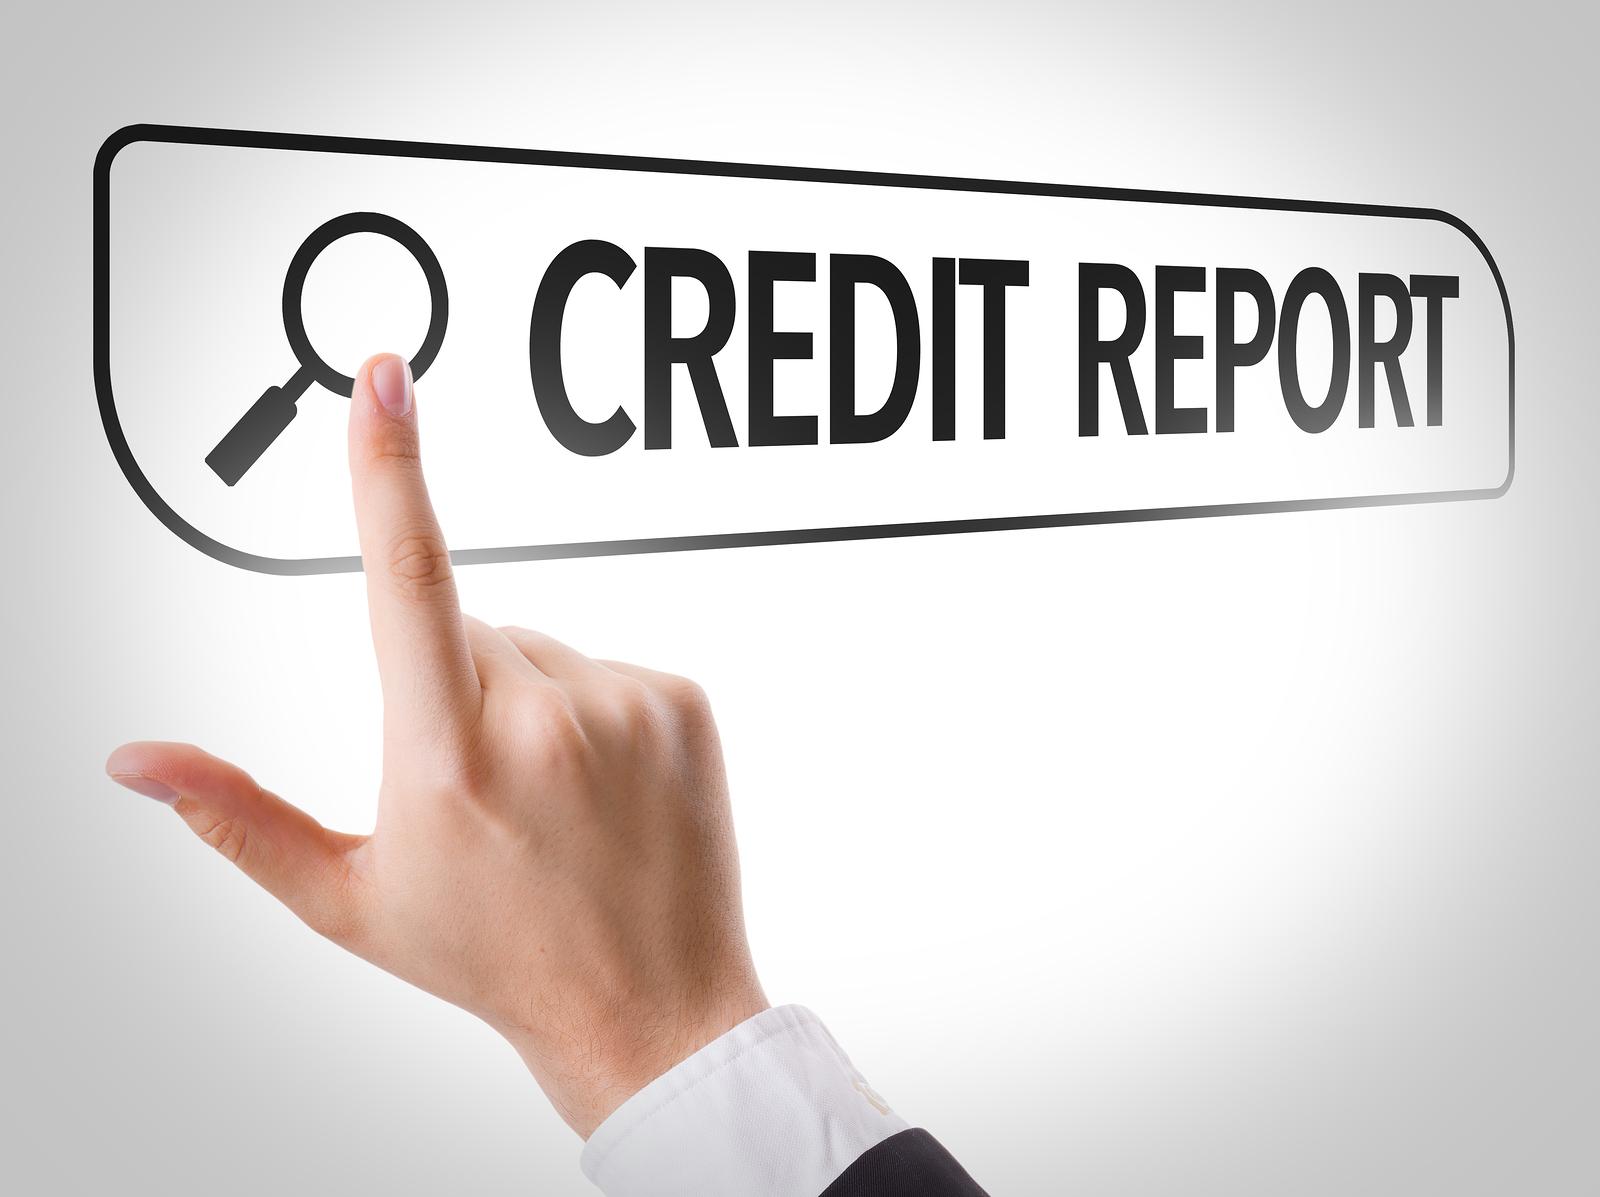 Credit Report written in search bar on virtual screen